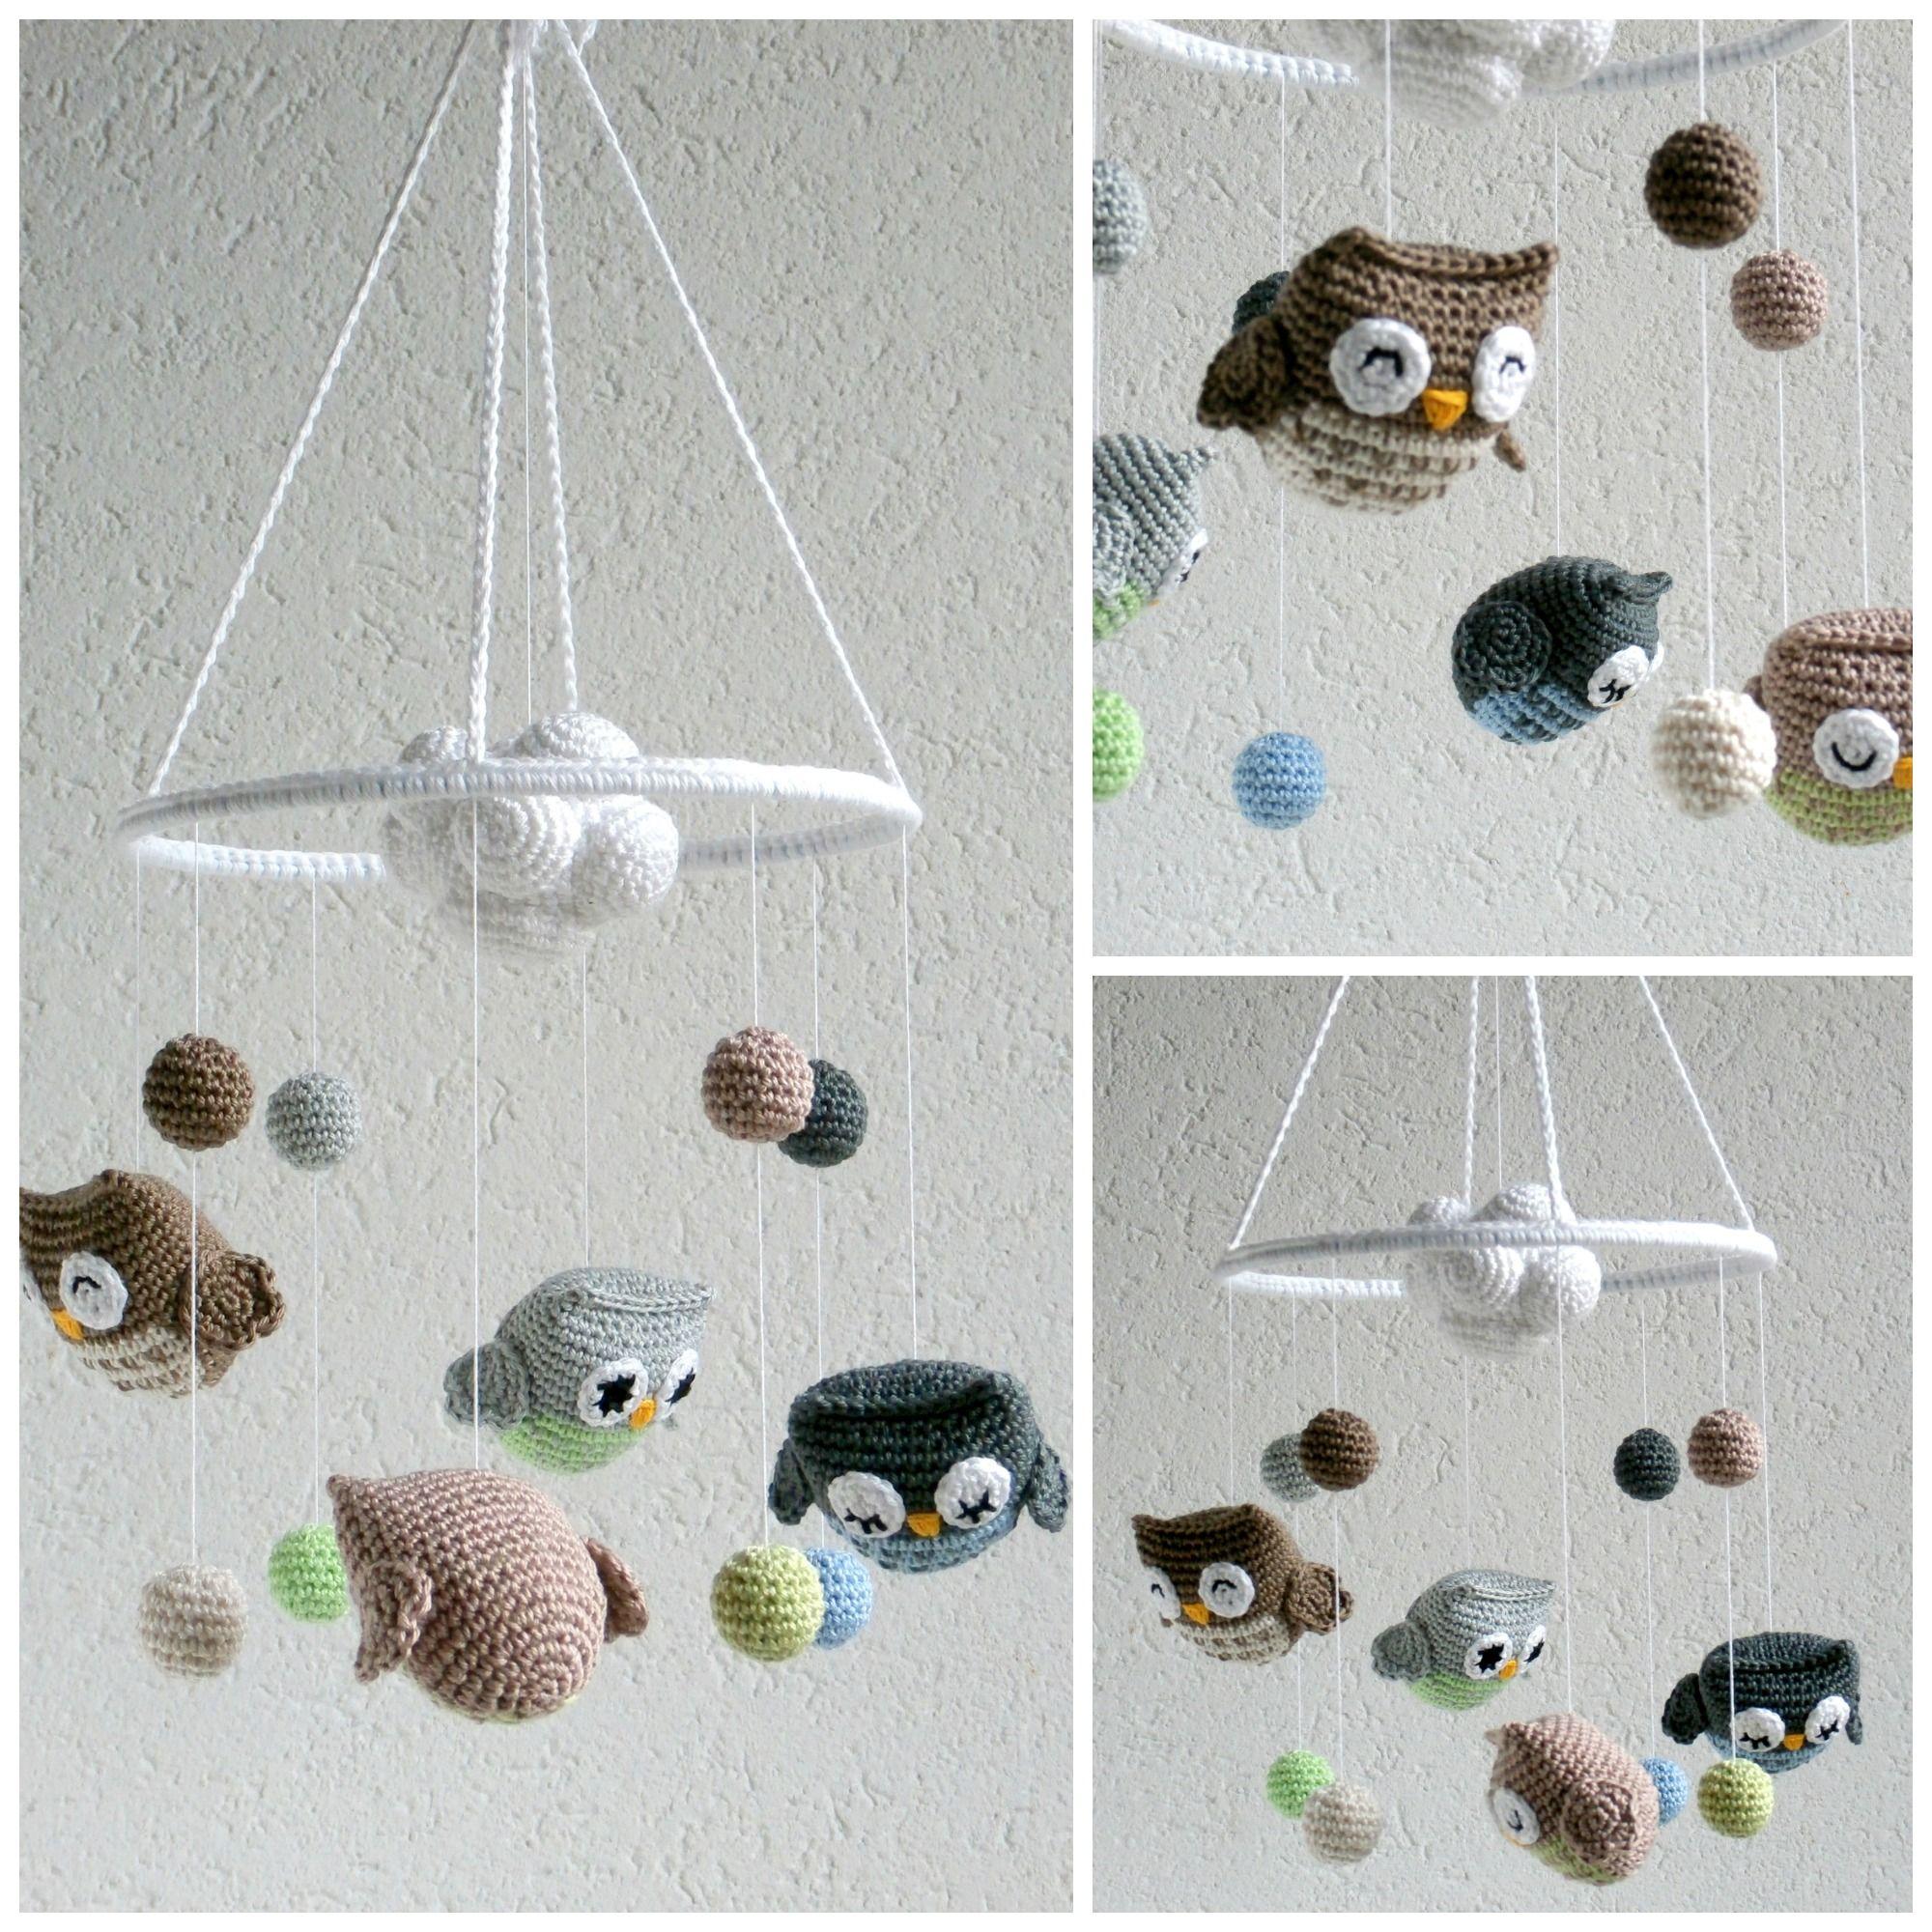 Baby Mobile gehäkelt mit Eulen&Wolke | Mobile Baby gehäkelt crochet ...